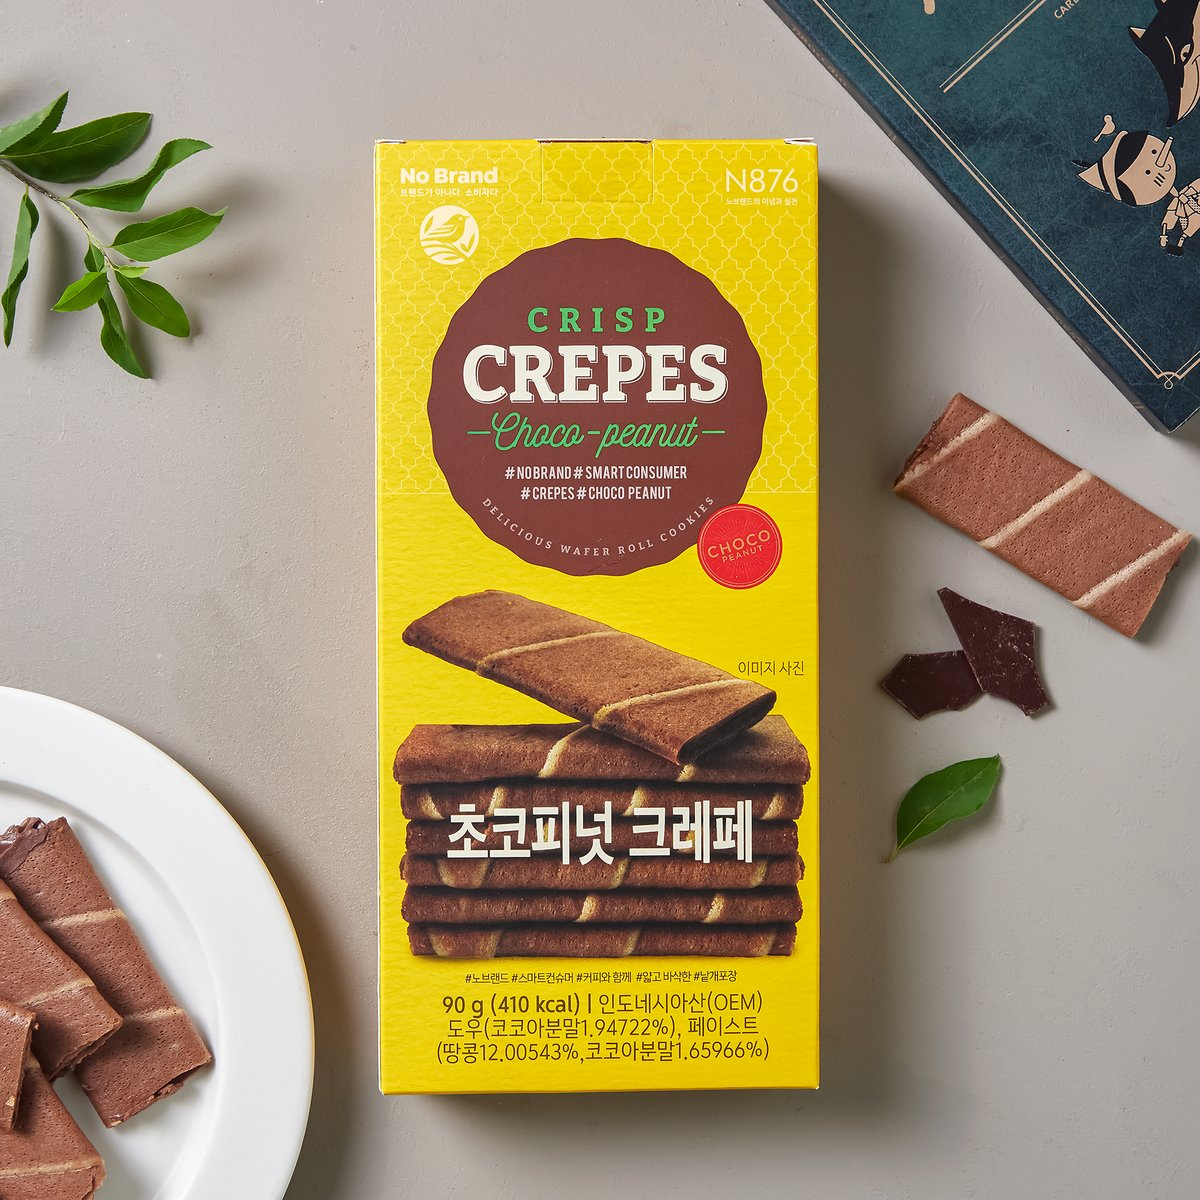 No Brand Crisp Crepe 朱古力花生薄脆 90g